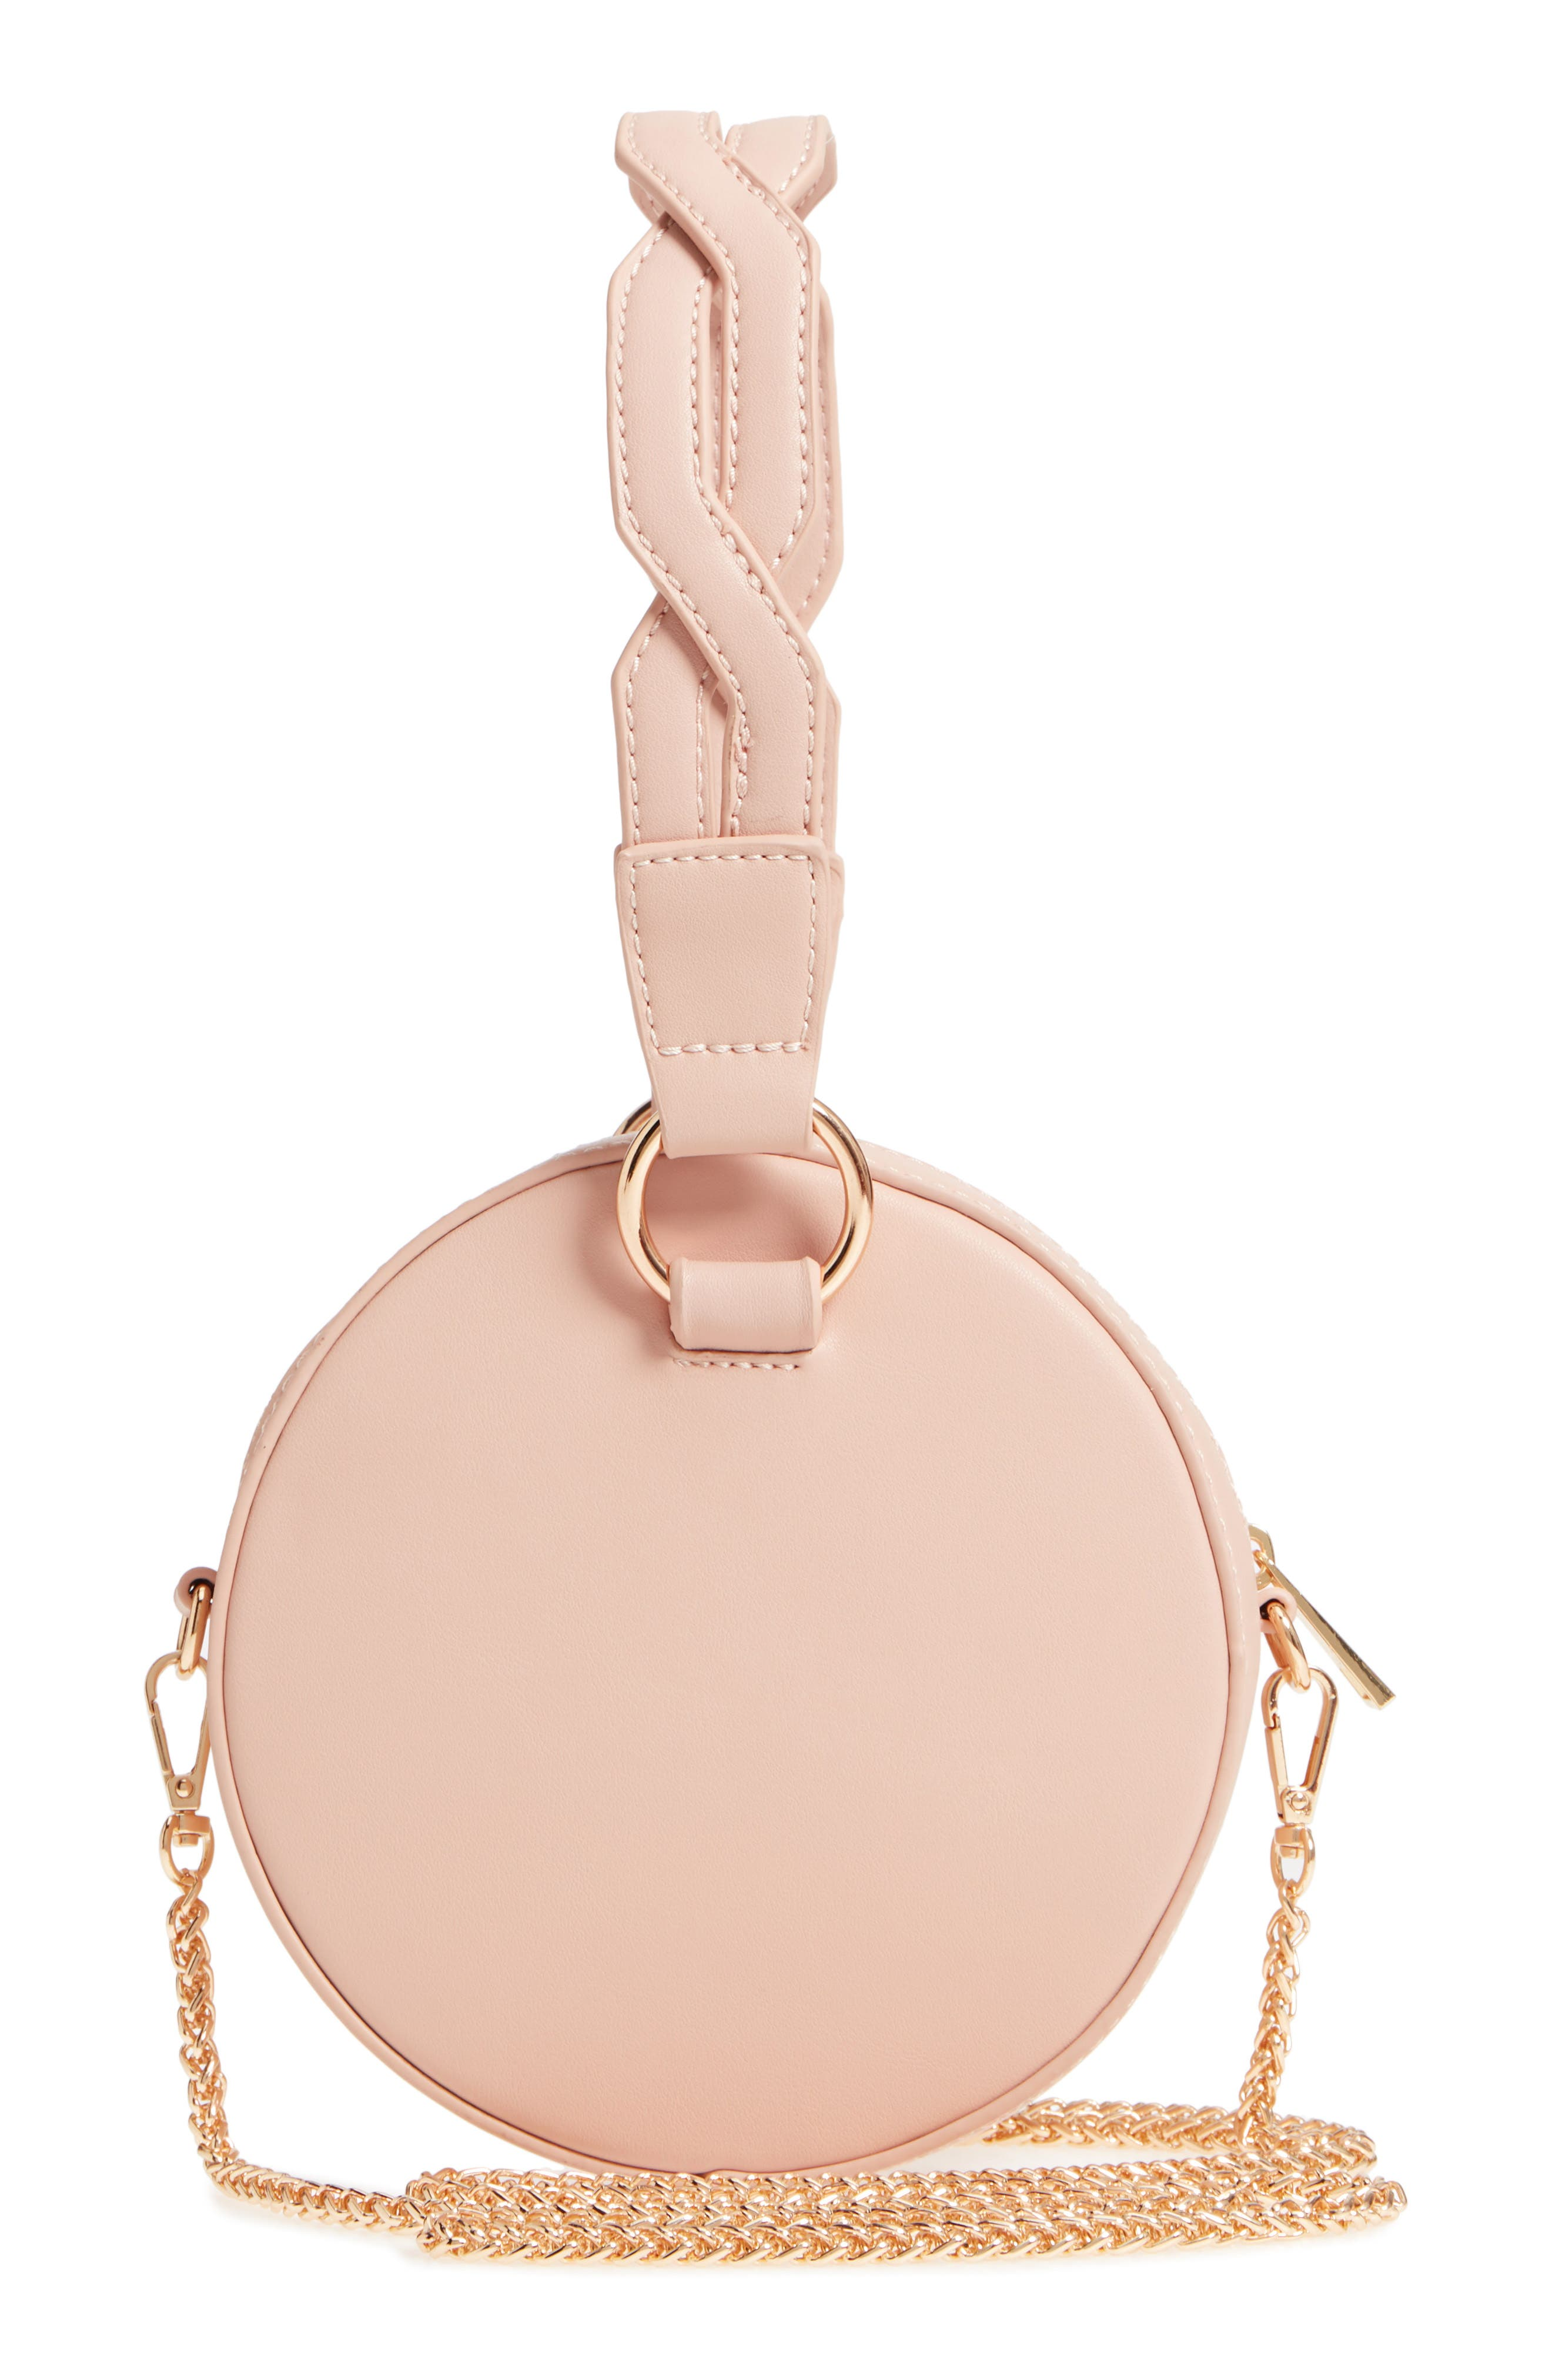 Circle Bag with Wristlet,                             Alternate thumbnail 3, color,                             250